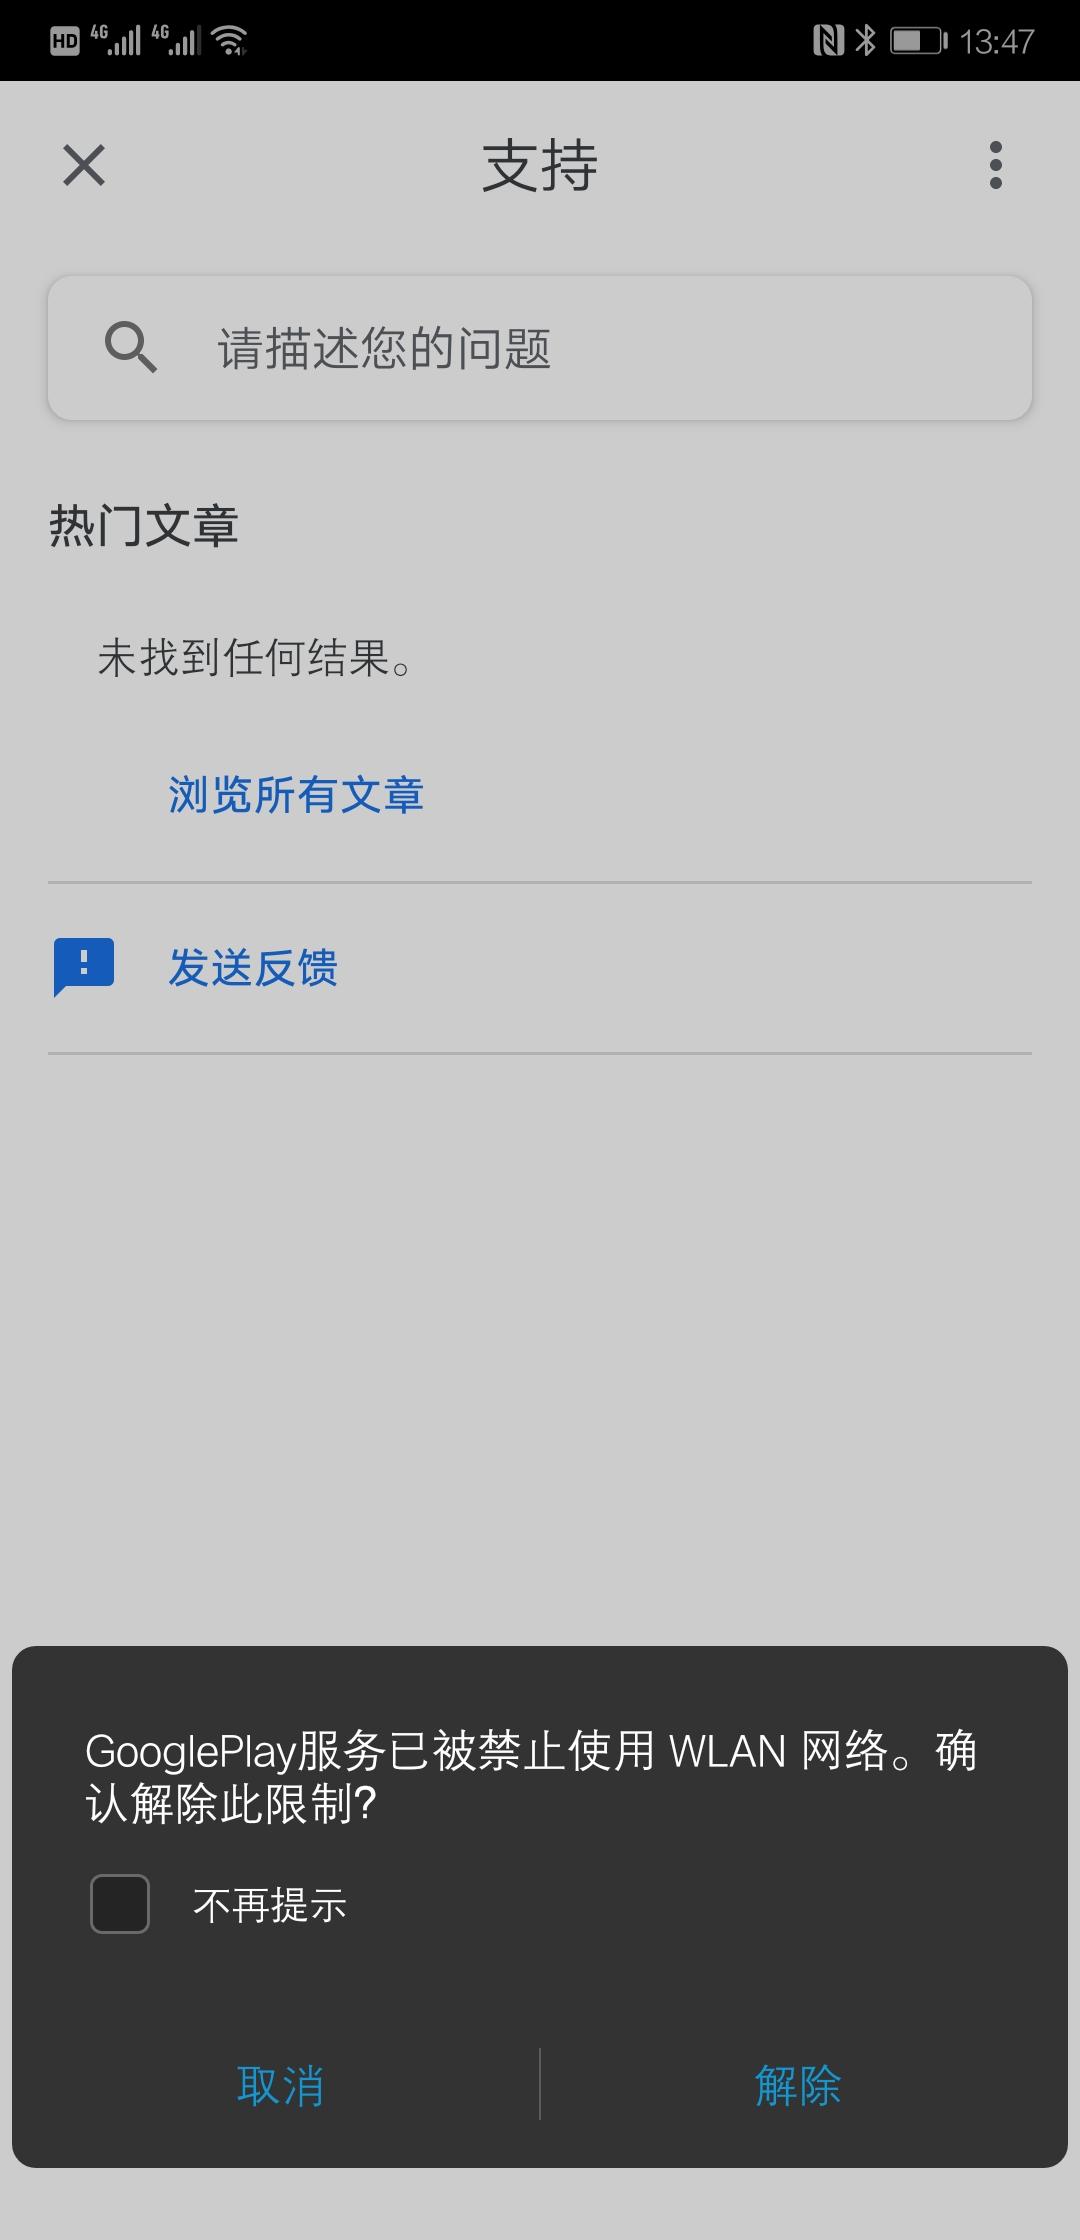 Screenshot_20190801_134702_com.google.android.gms.jpg